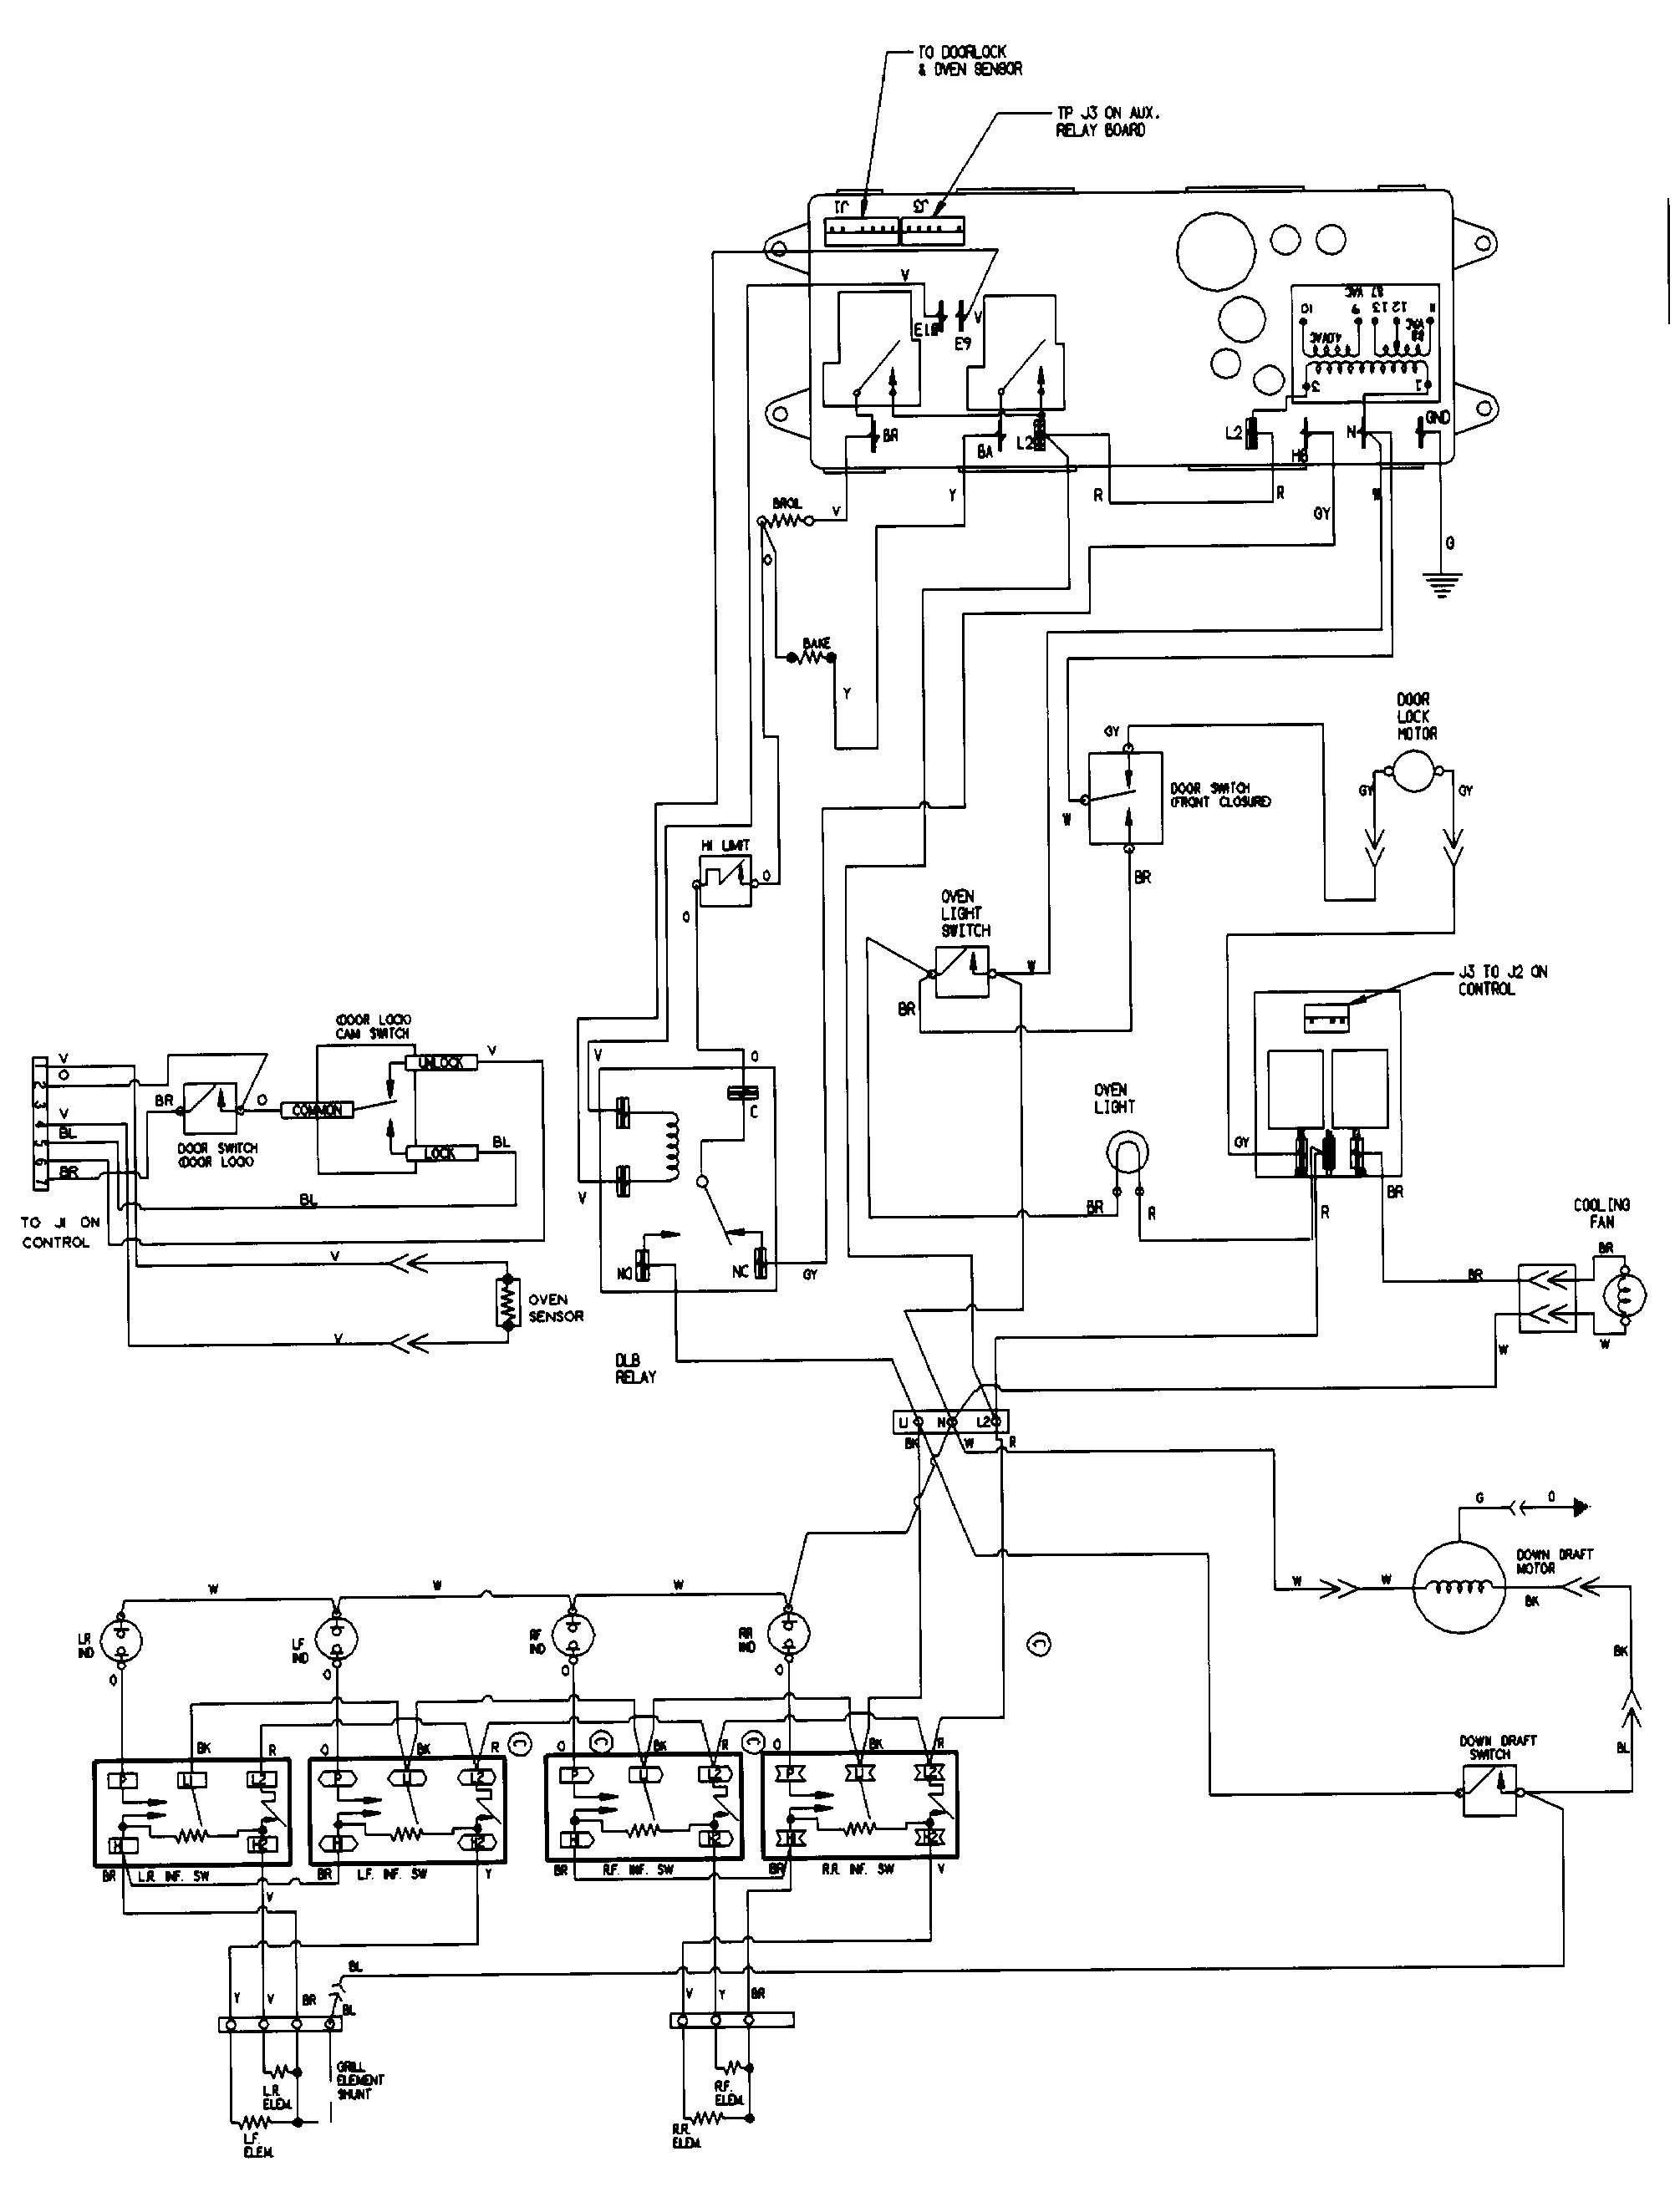 Fine Haulmark Motorcoach Wiring Diagram Wire An Outlet Diagram